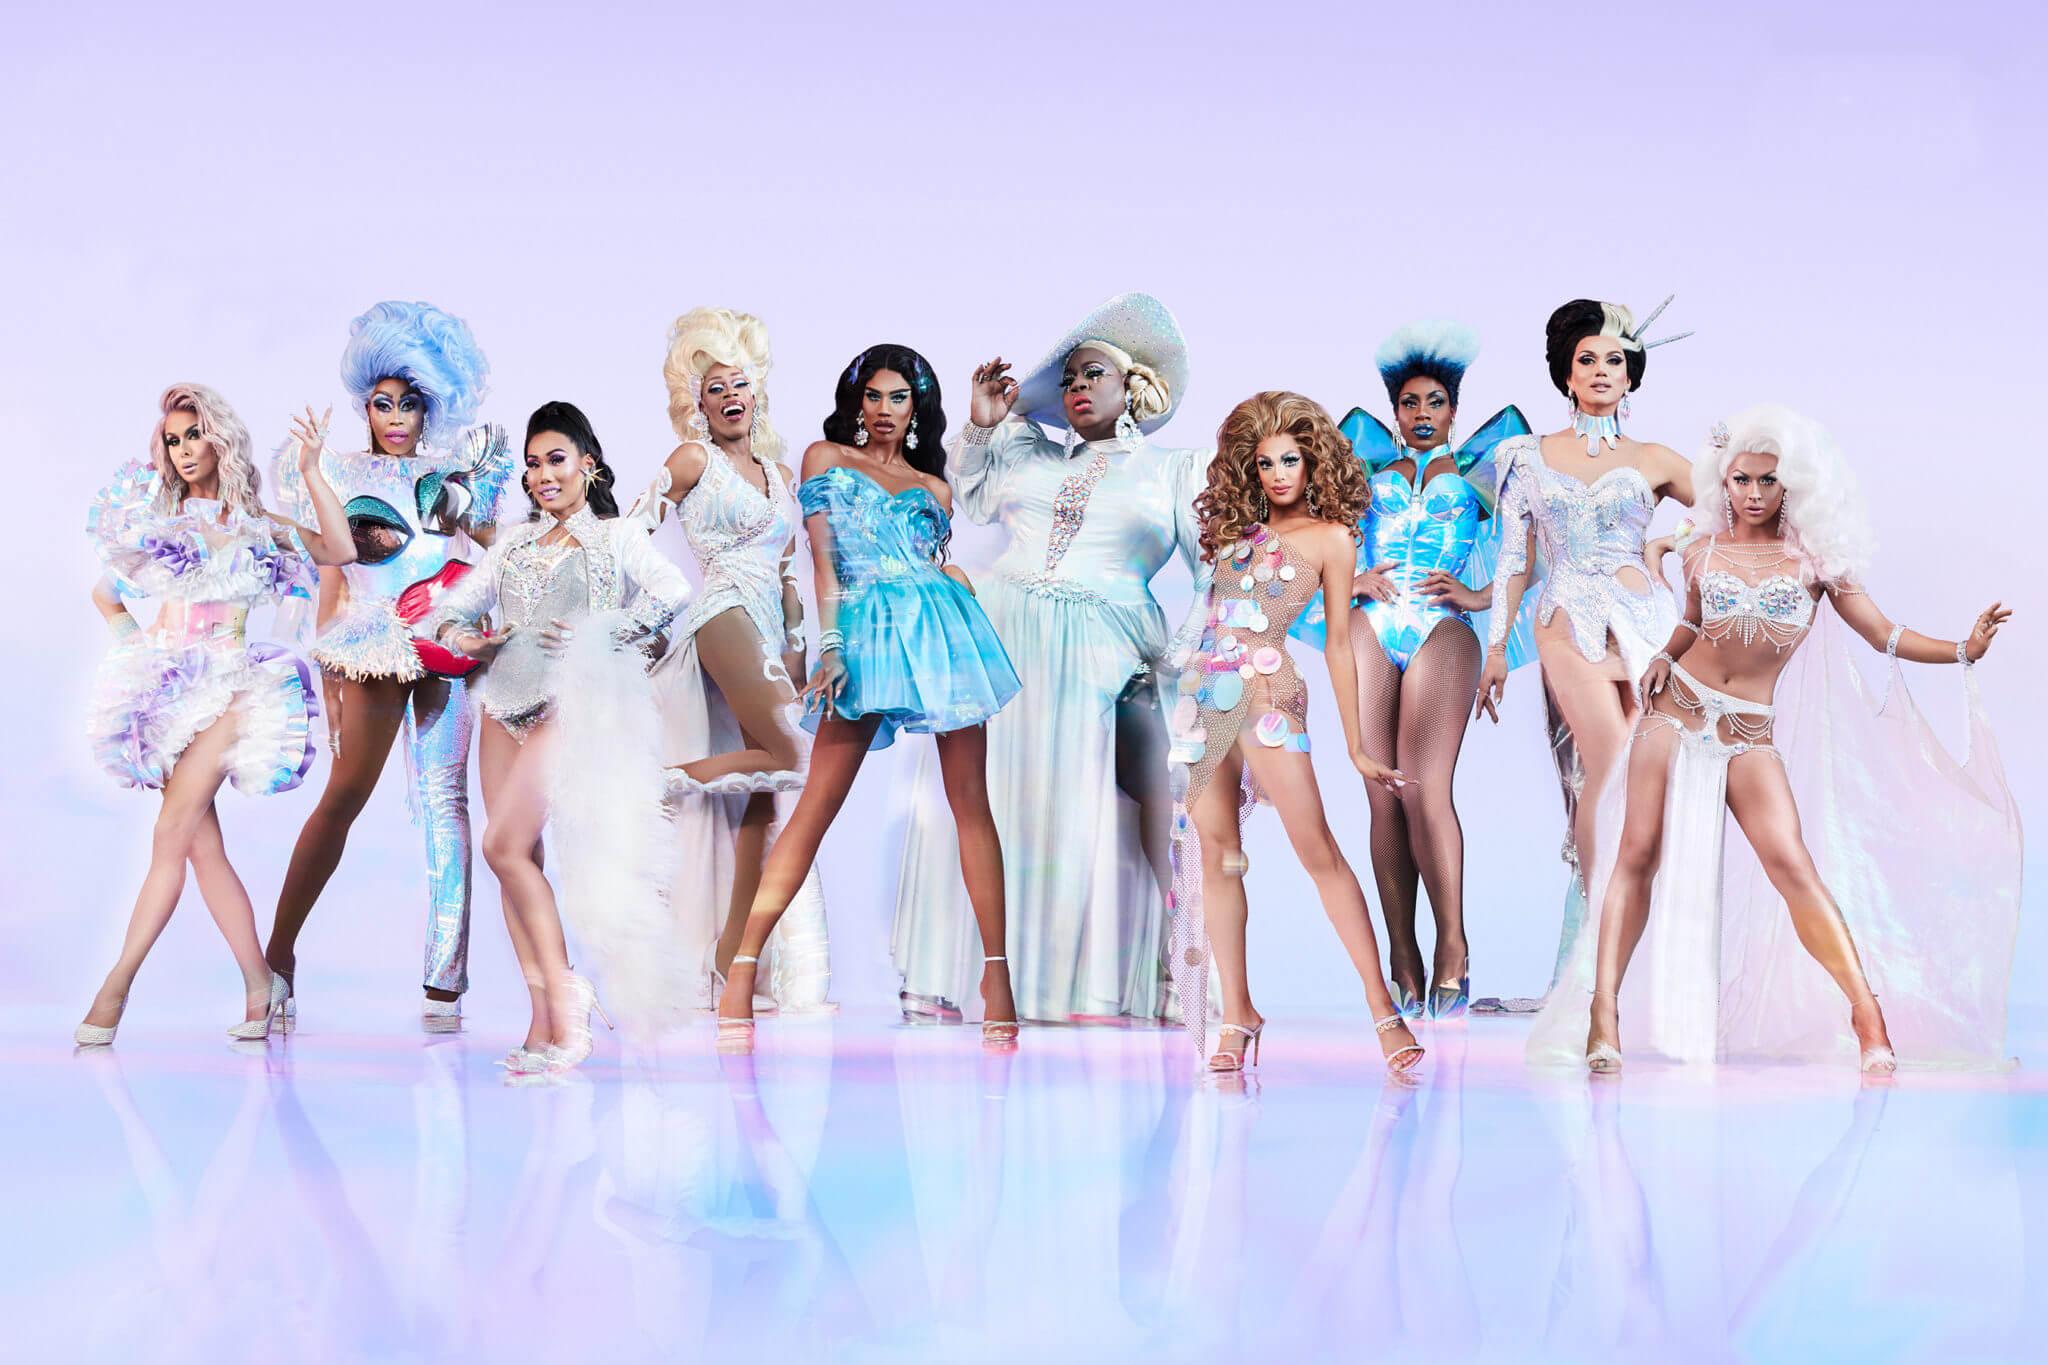 El elenco completo del RuPaul's Drag Race All Stars 4. Fotografía: EW